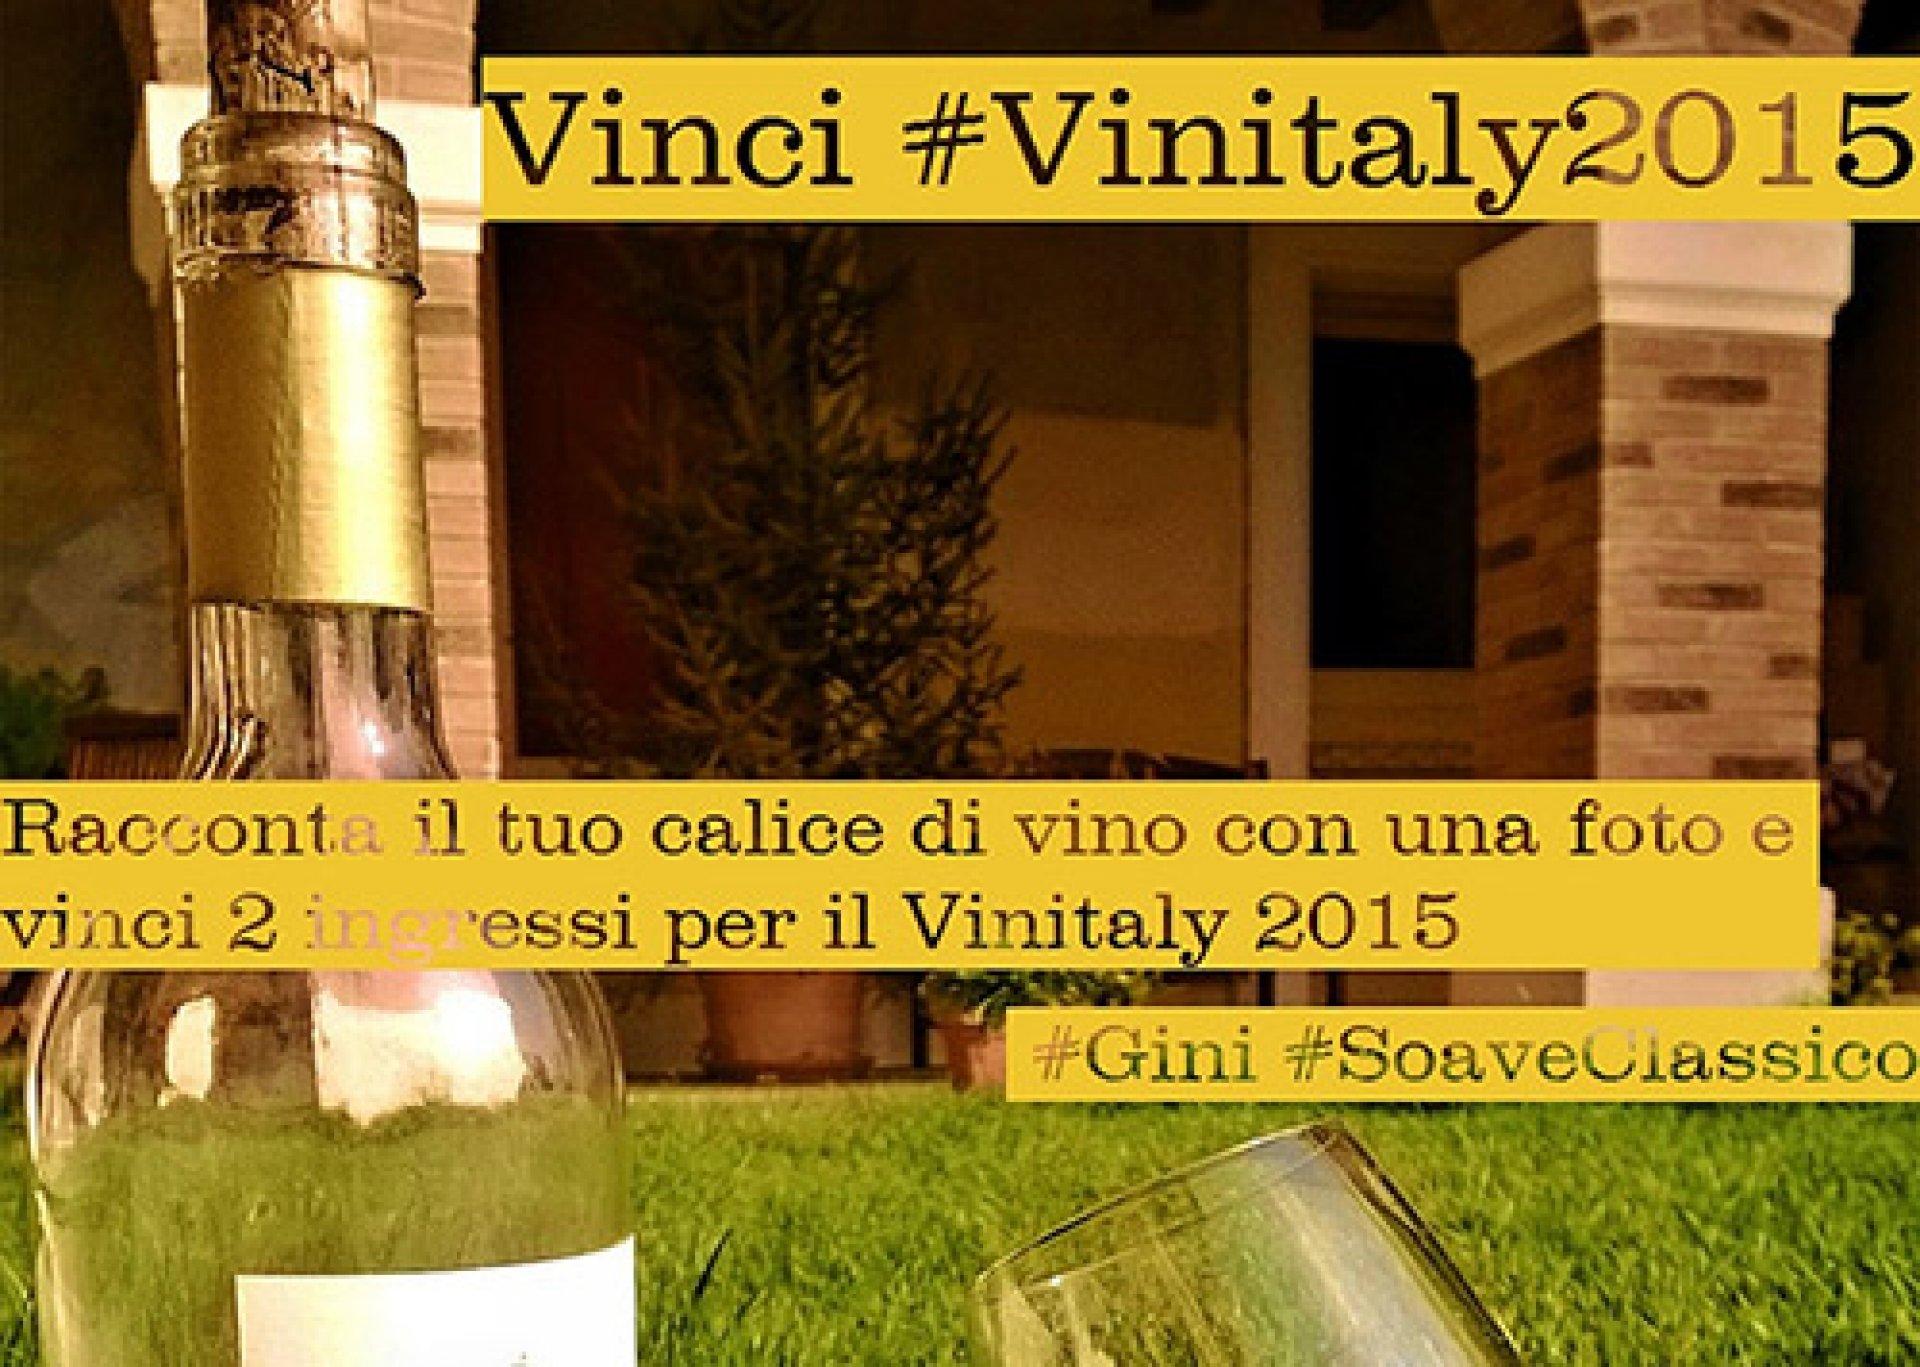 Vinci il Vinitaly 2015